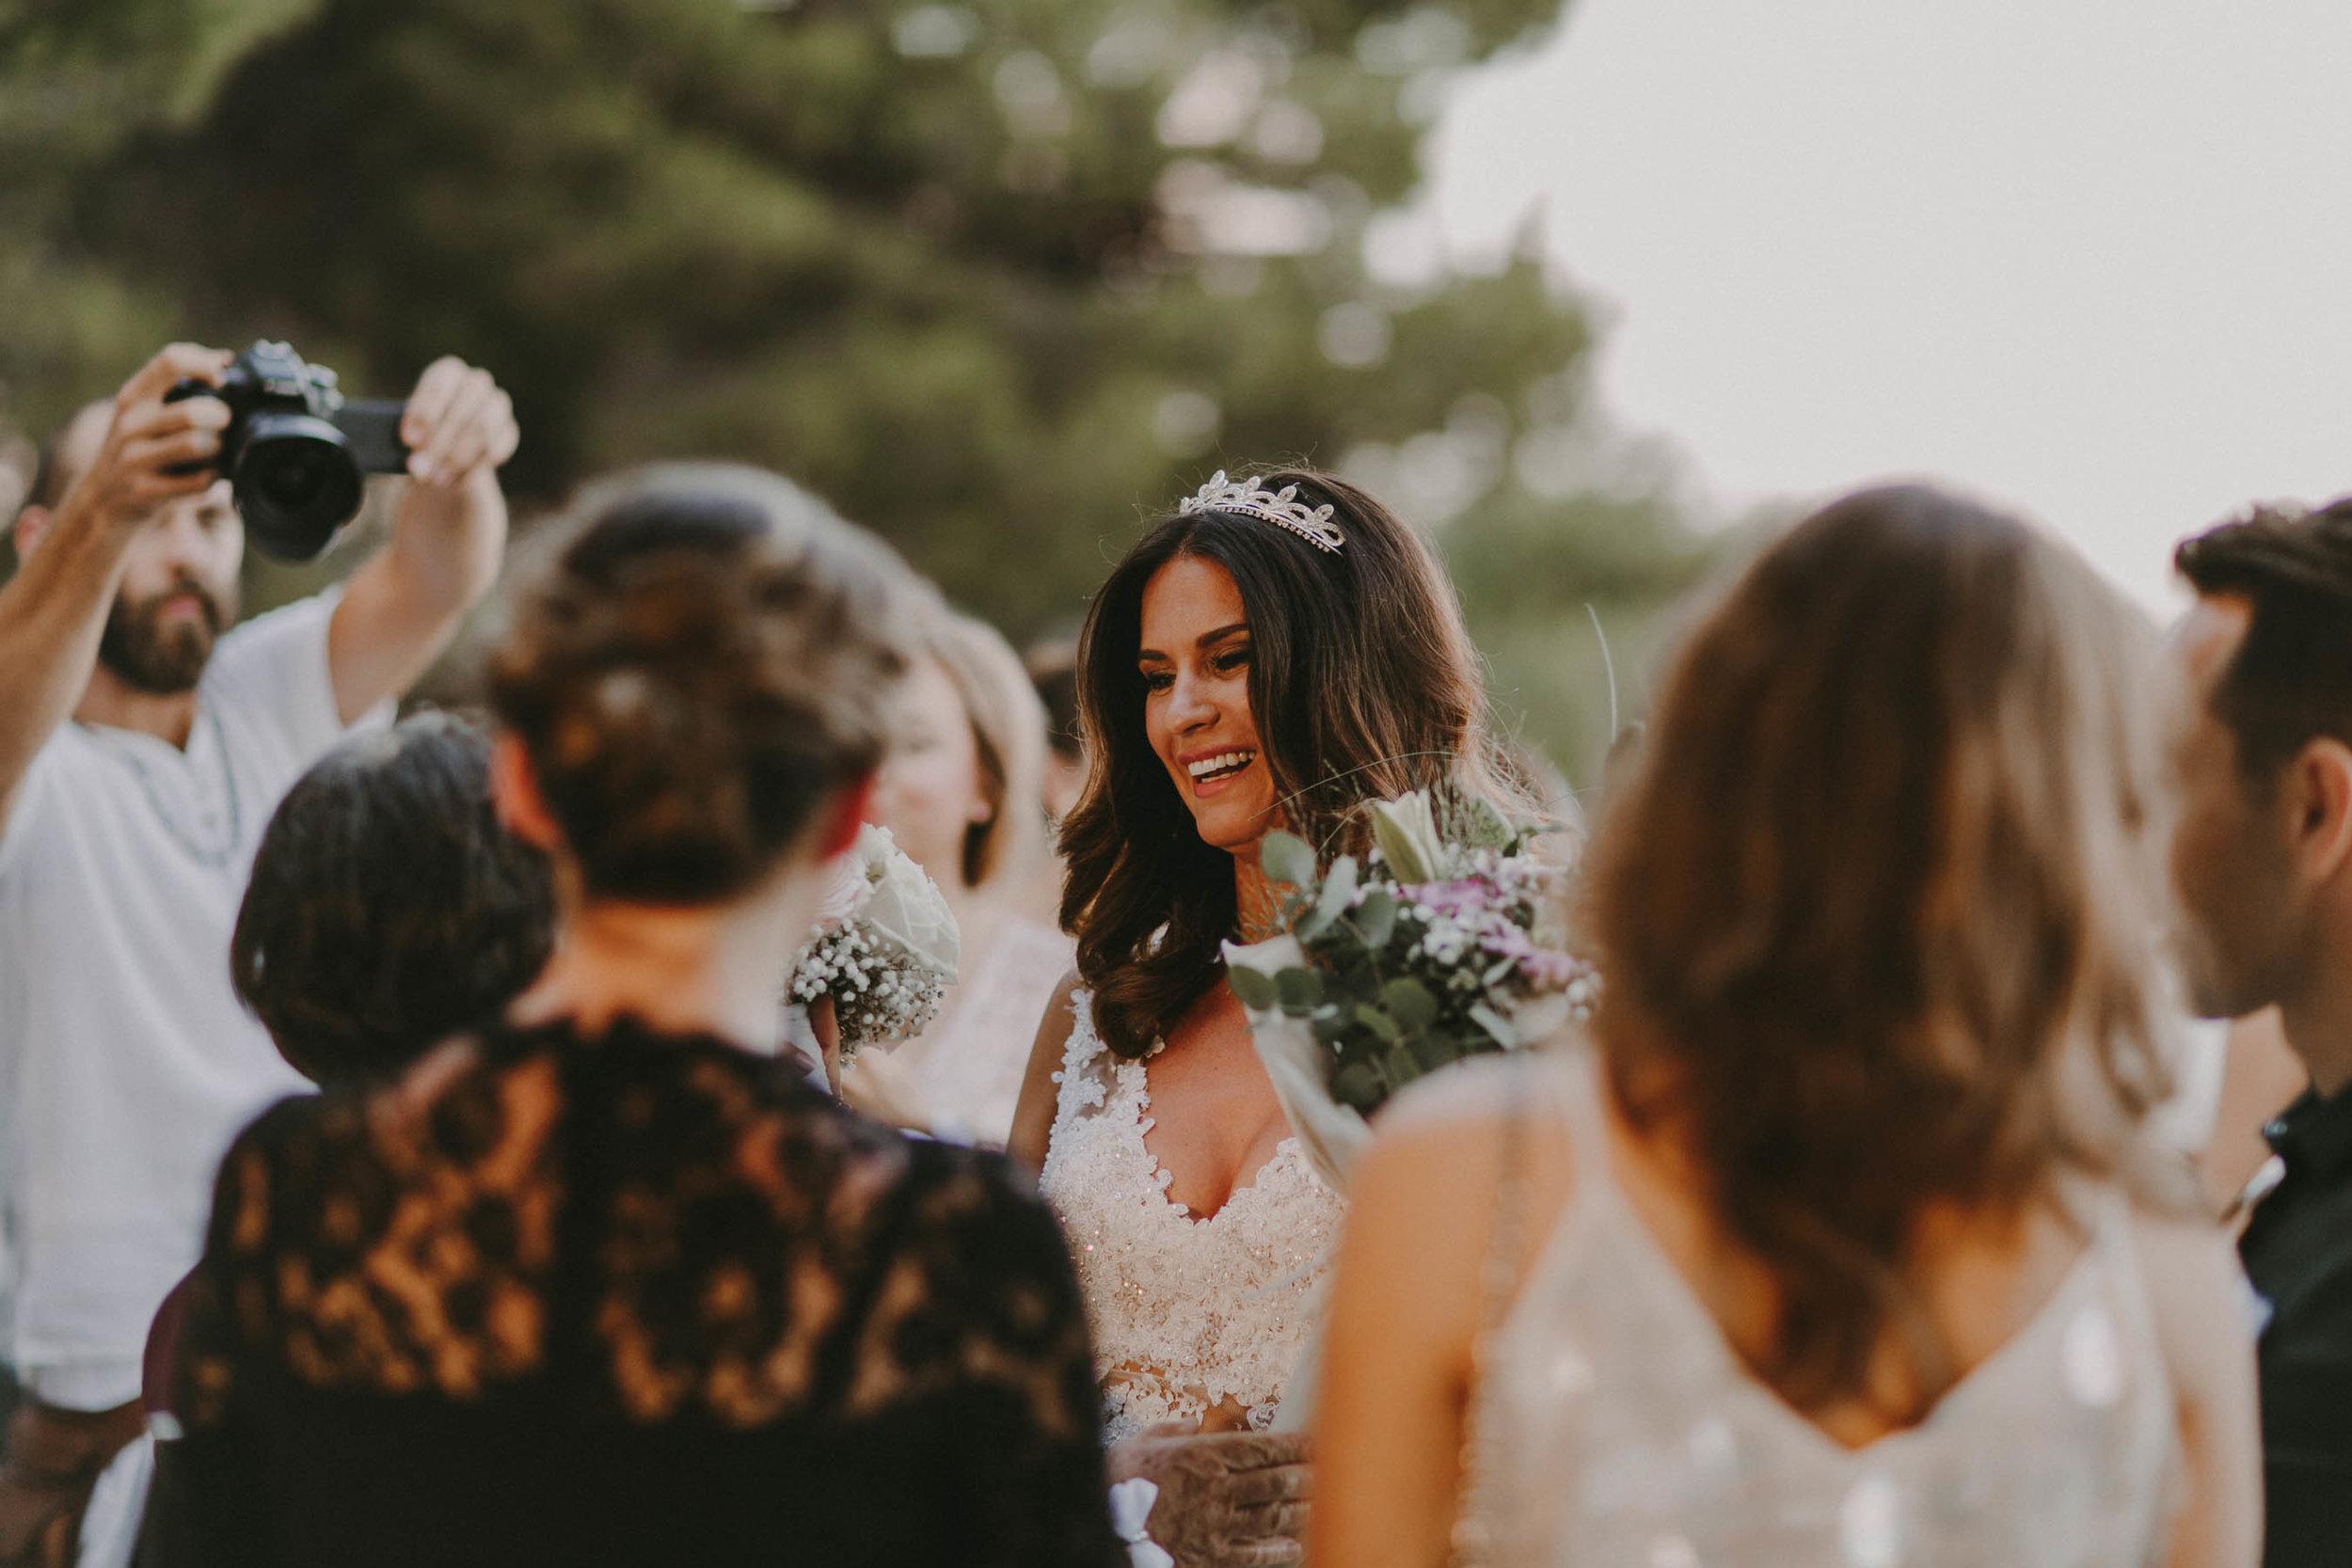 sylvia&dimitri-Wedding-Crvena_Luka-Croatia-48(7779).jpg